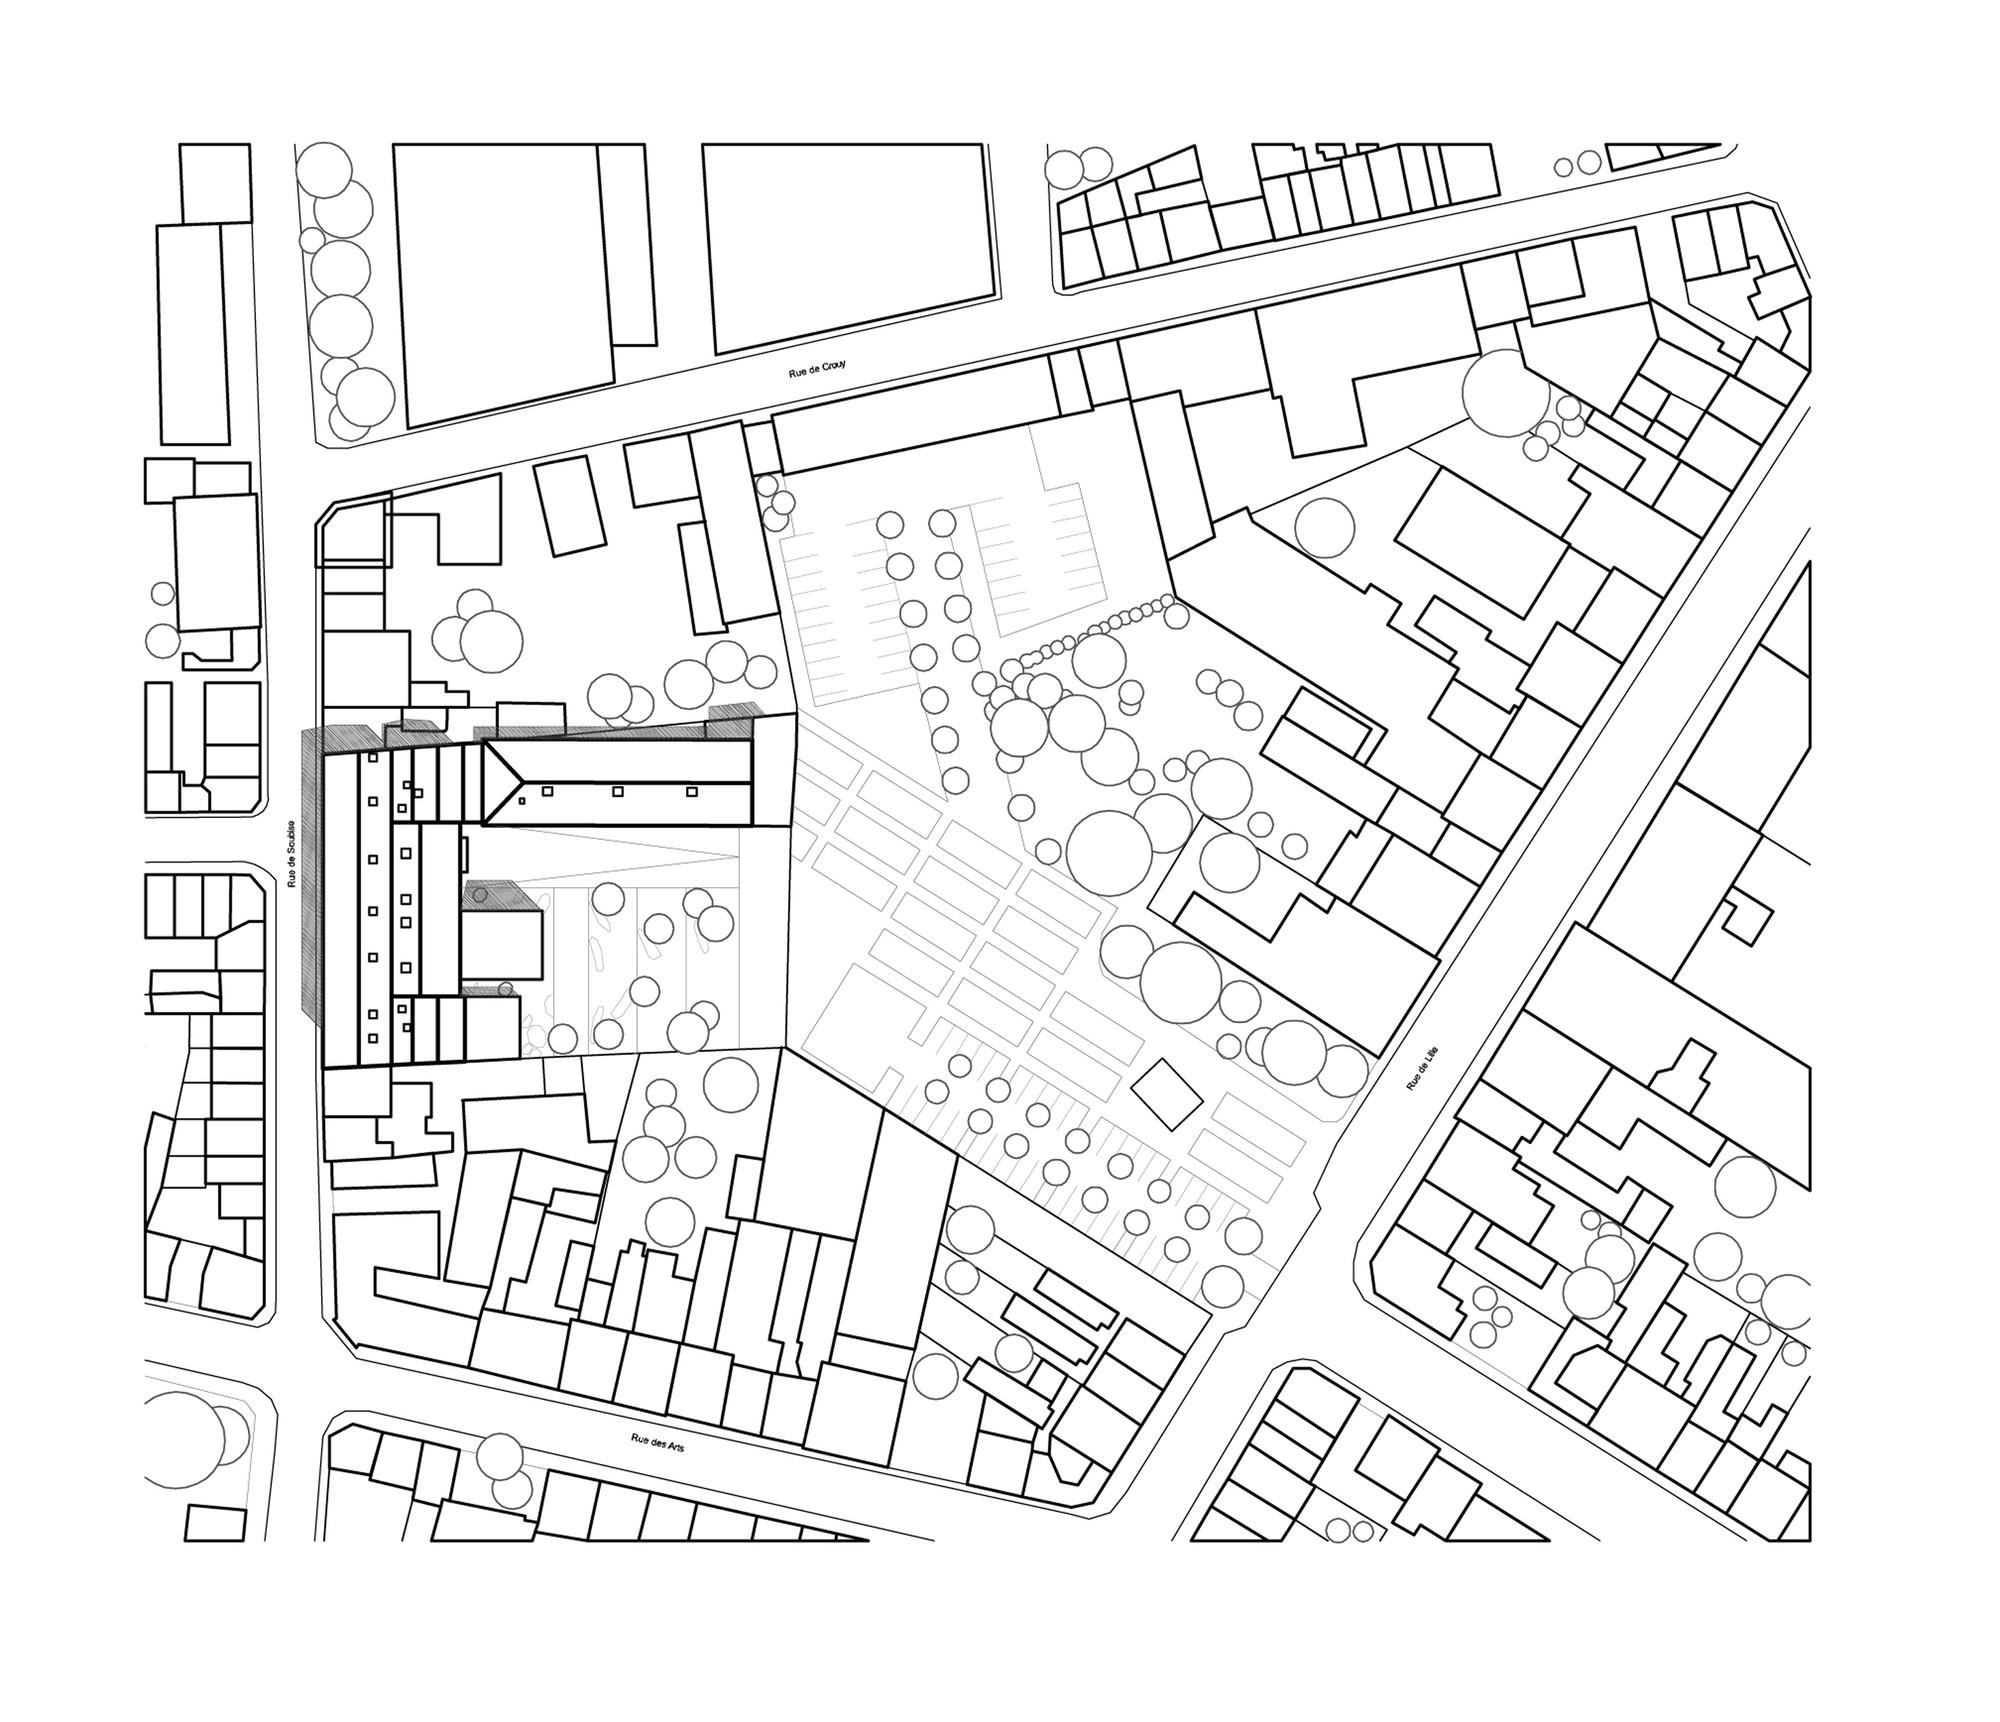 2000x1722 Gallery Of Music Academy Of Roubaix Zig Zag Architecture